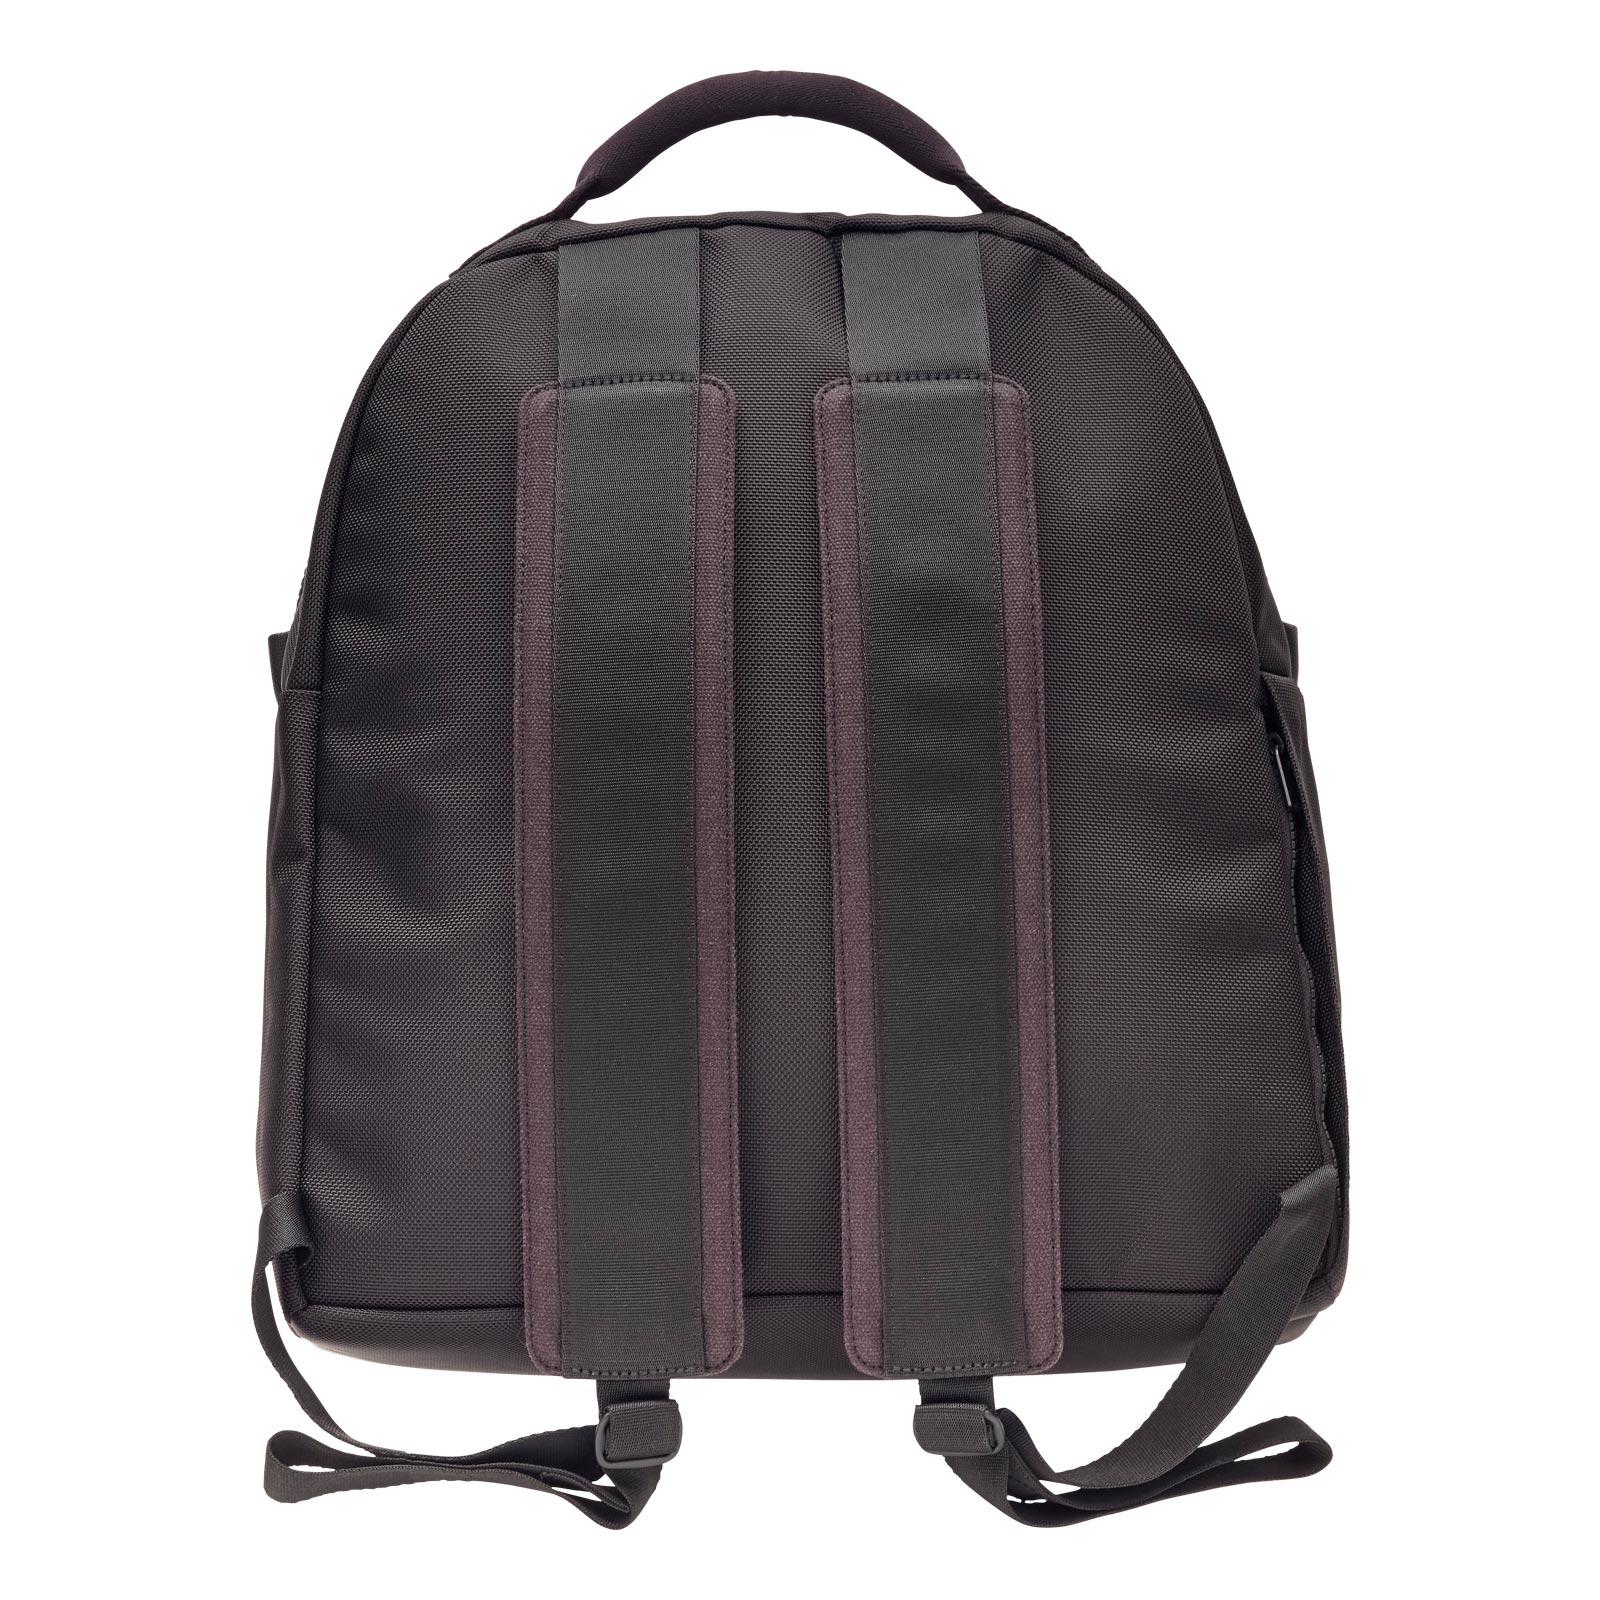 09d753eabdc6 ... adidas Originals by Kanye West KW Backpack